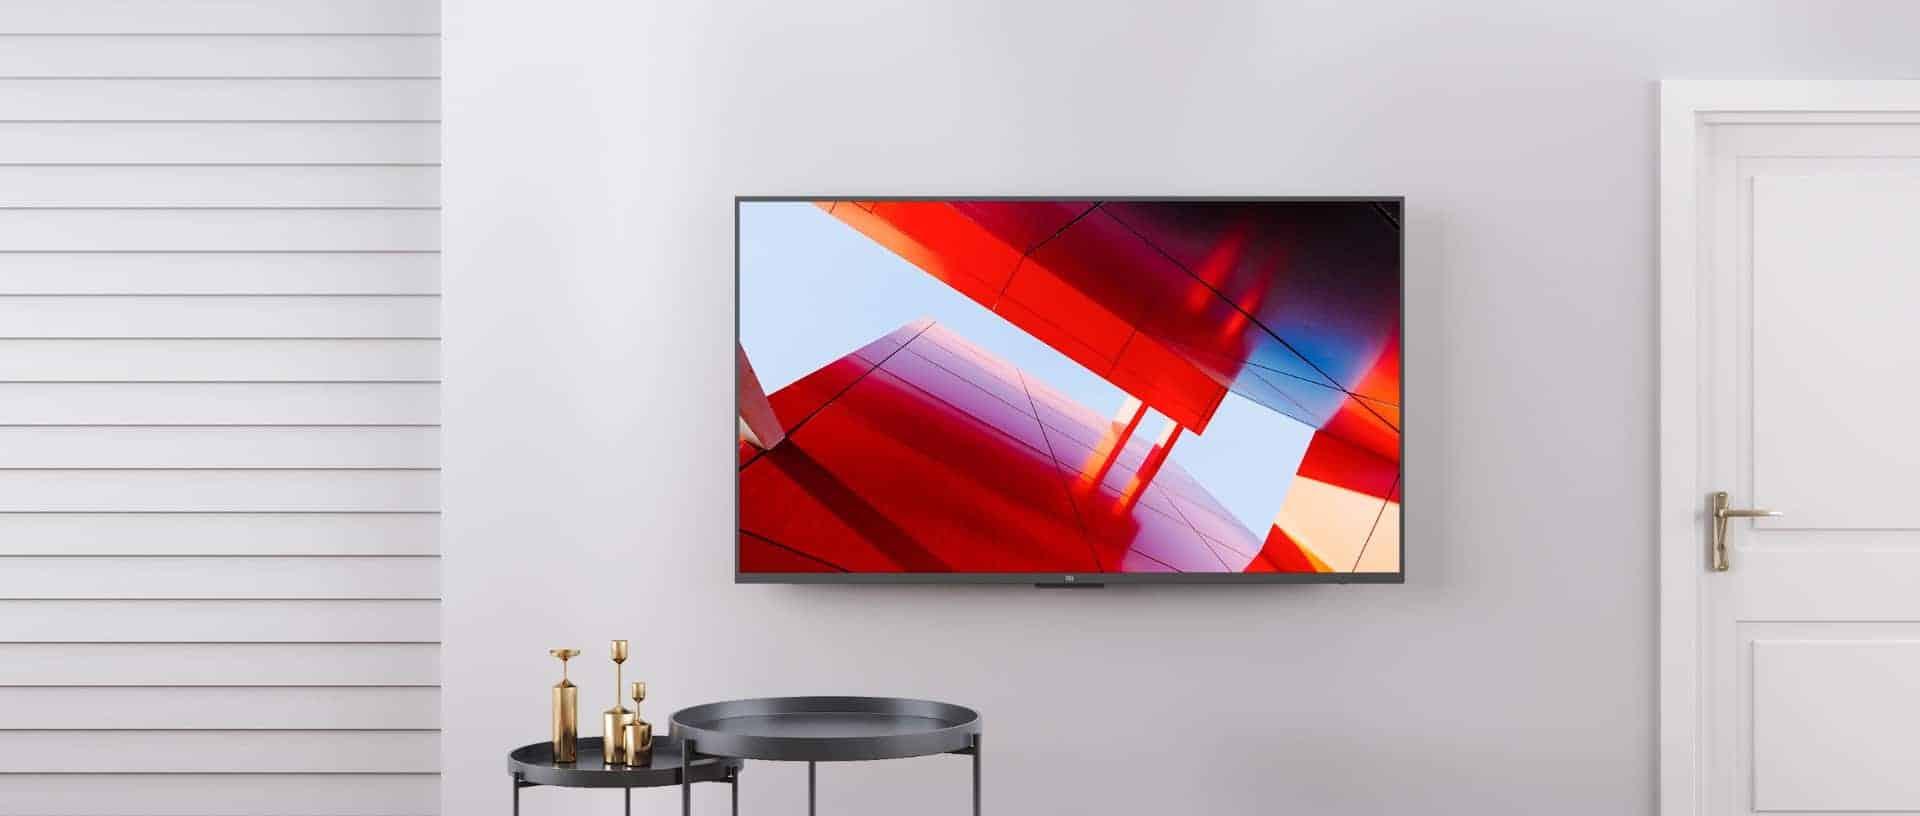 Xiaomi Mi TV 4S 55 inch image 3